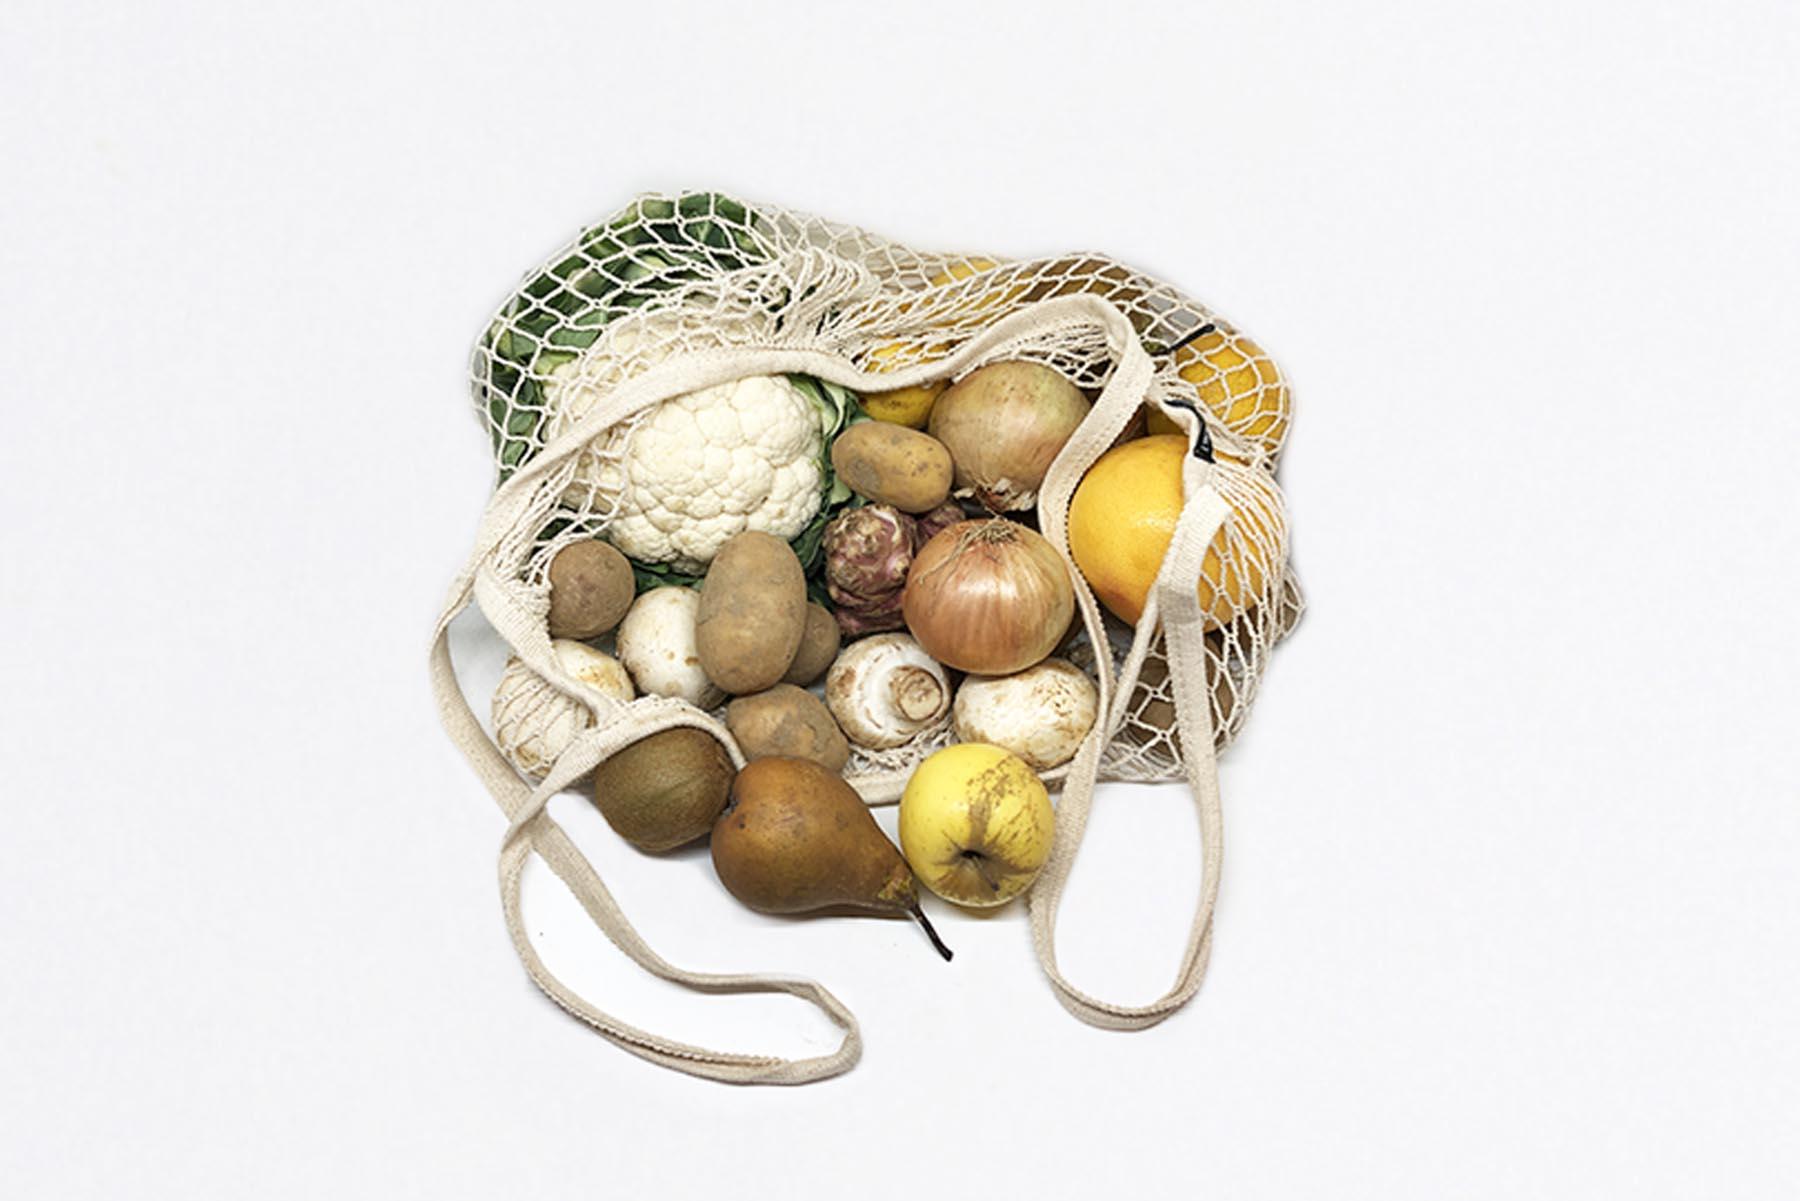 Moyen panier de fruits et légumes